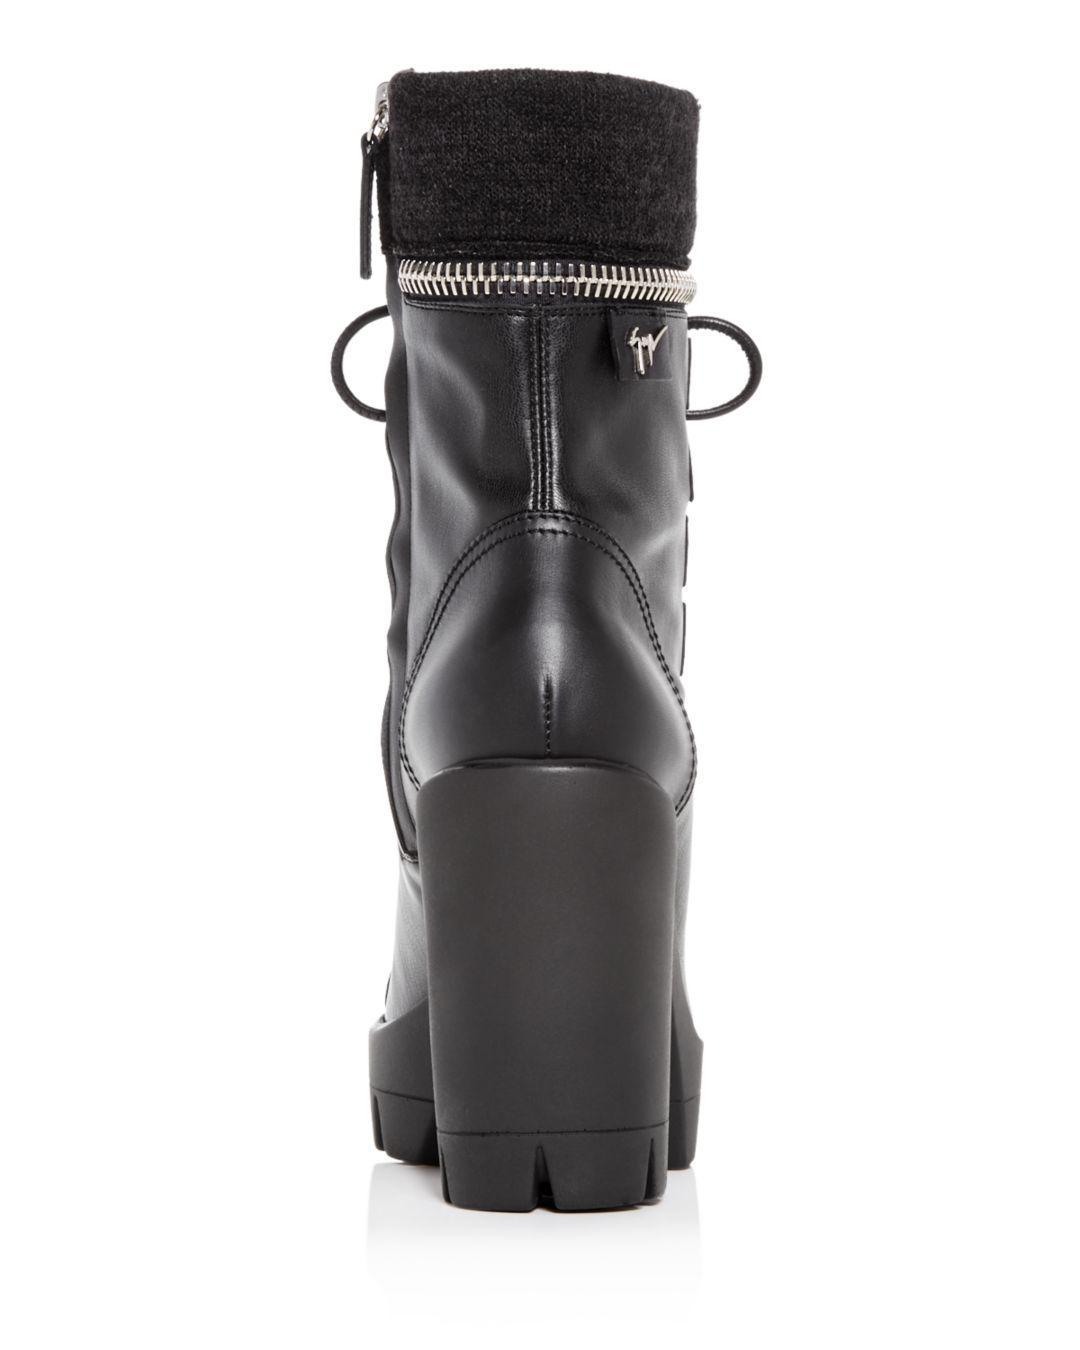 f4d5a37190b4 Lyst - Giuseppe Zanotti Women s Gintonic Leather Zip Top Block-heel ...